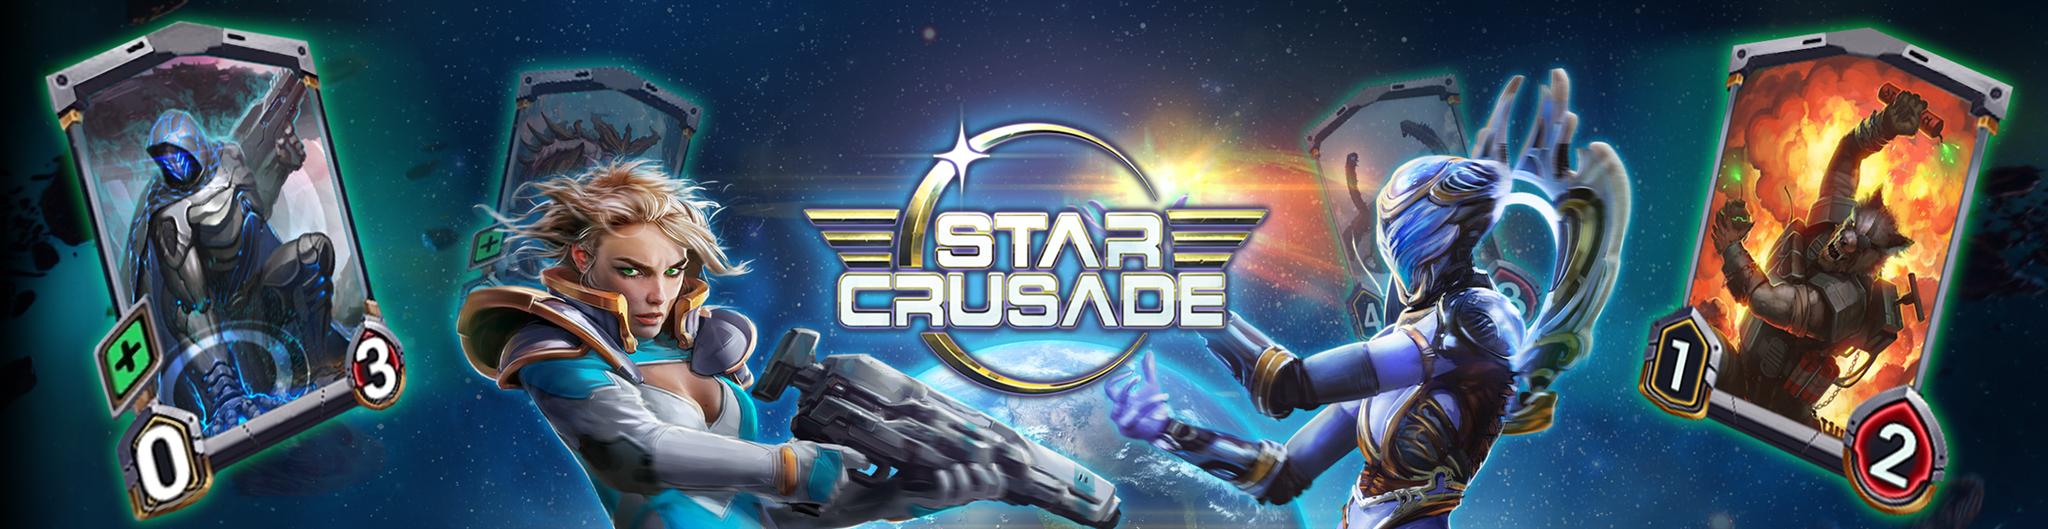 Star Crusade CCG banner